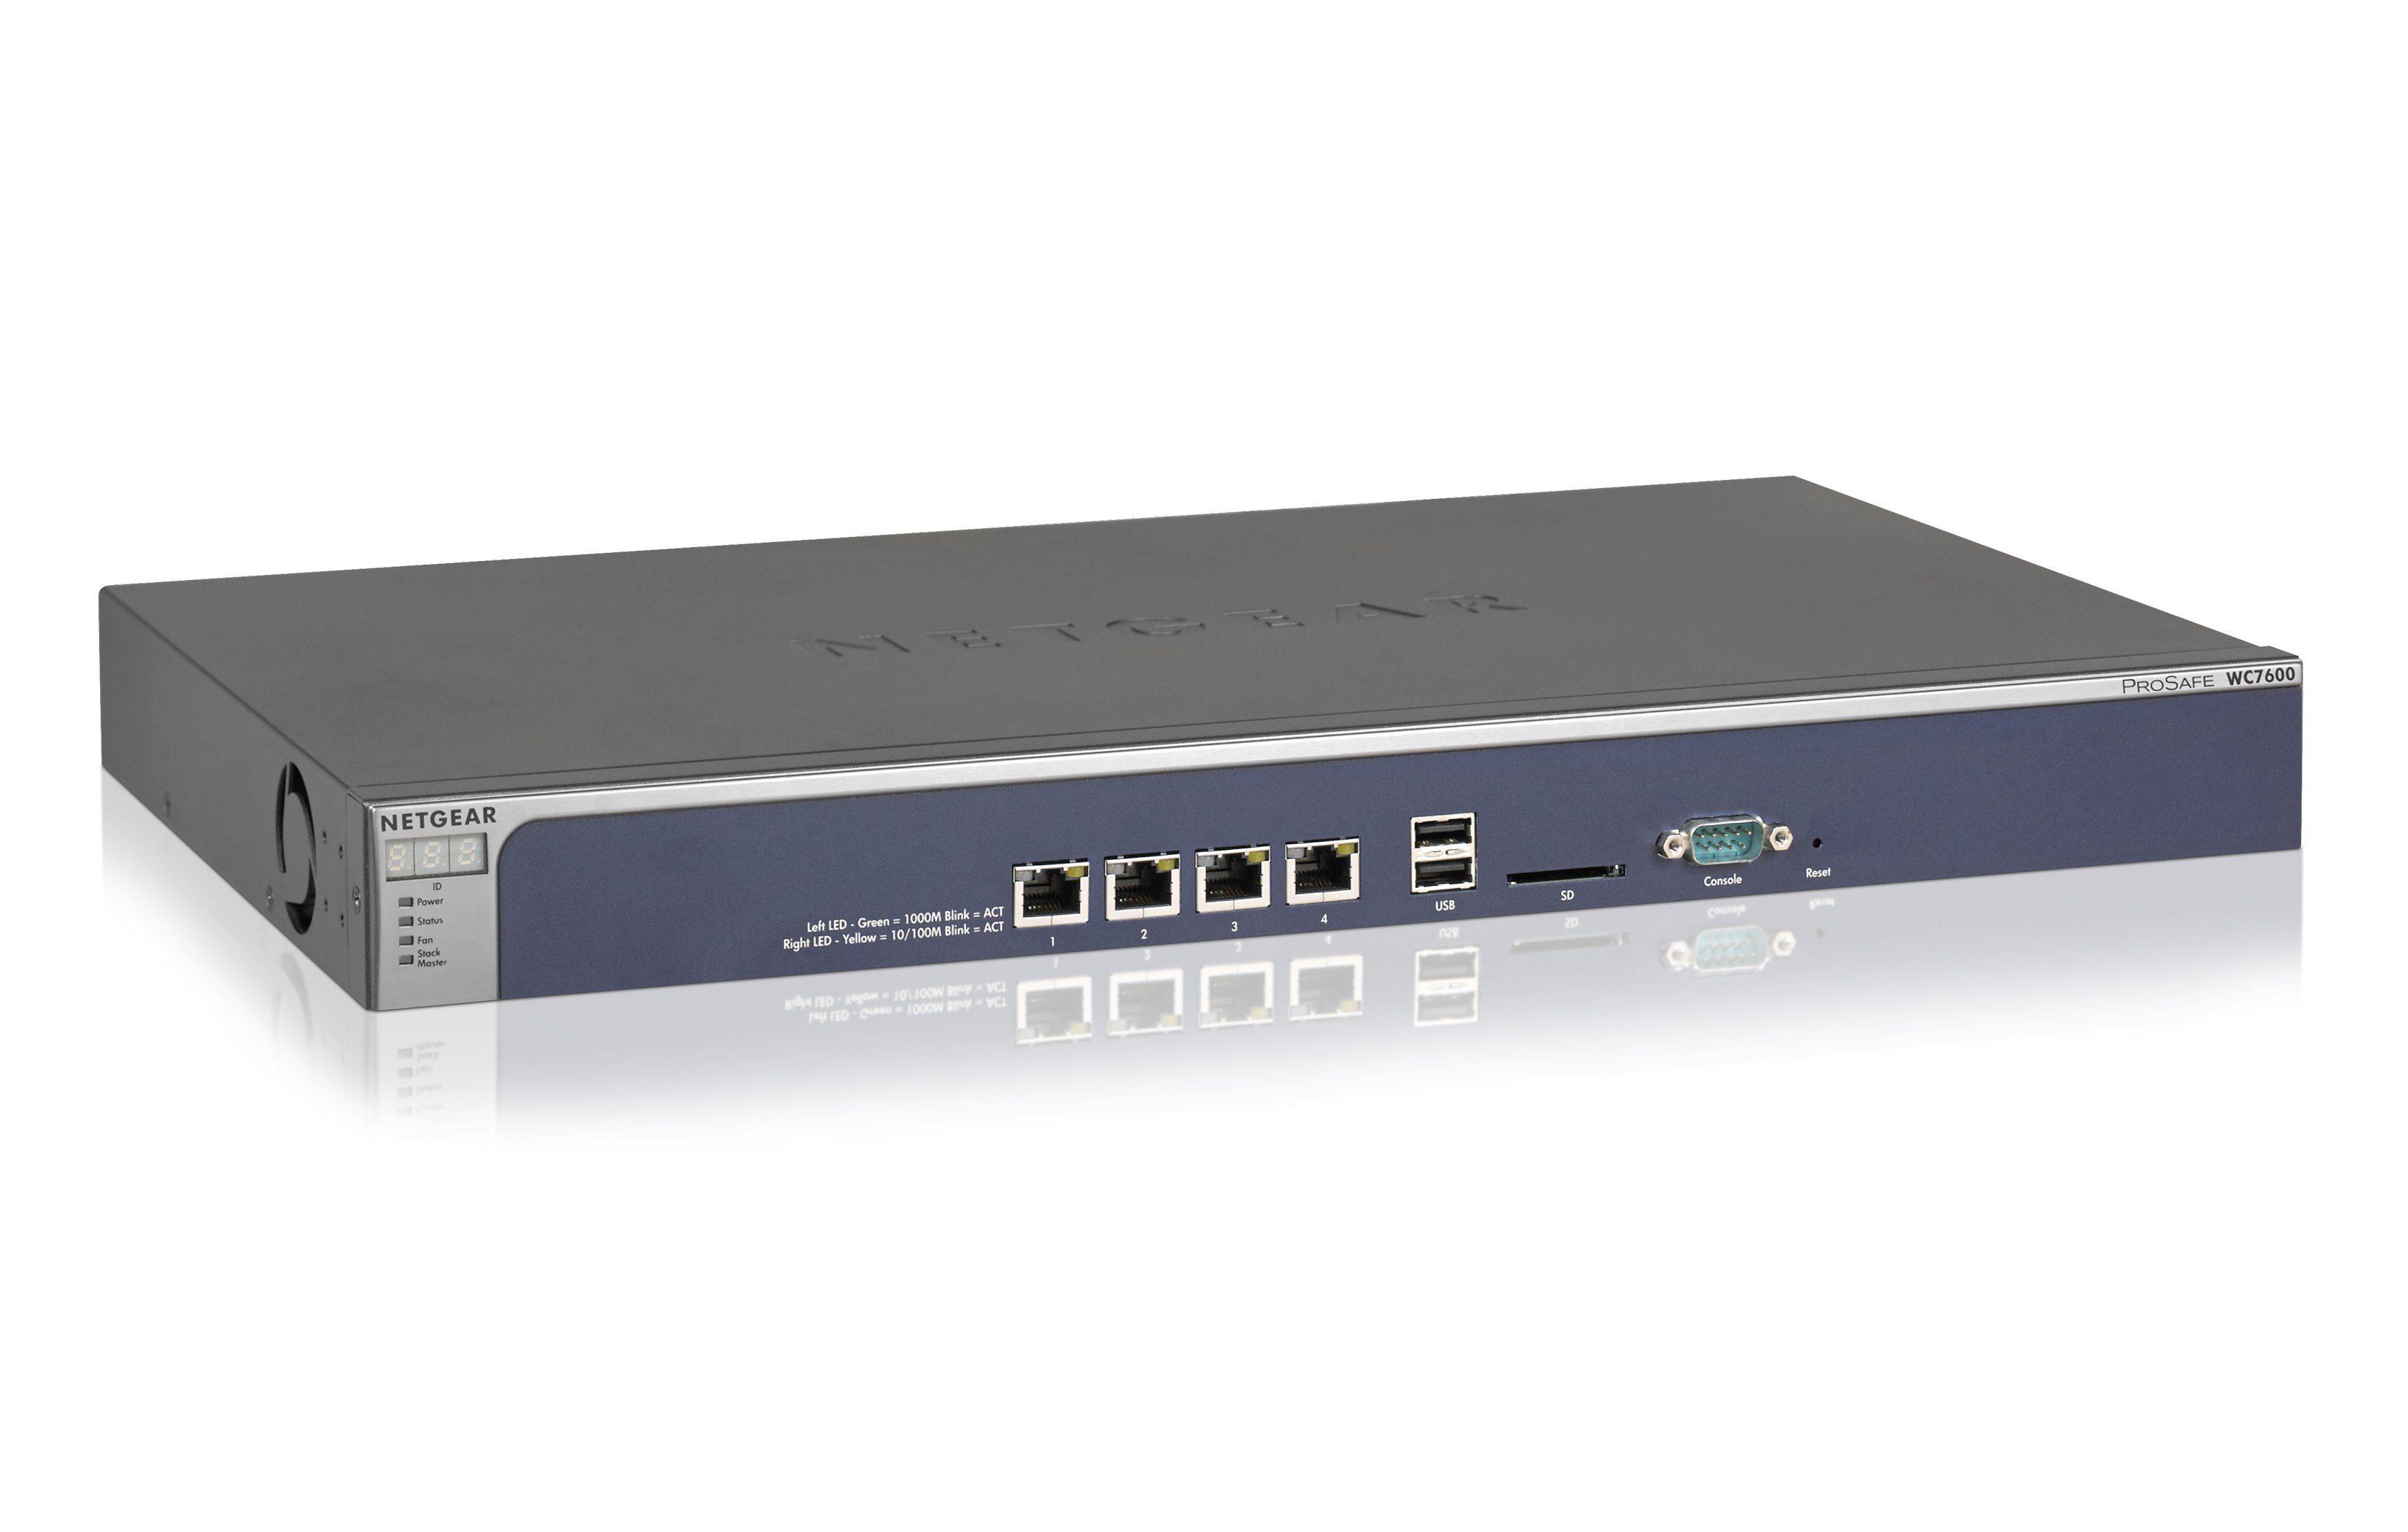 Netgear WLAN CONTROLLER »WC7600 50 AP PREMIUM«